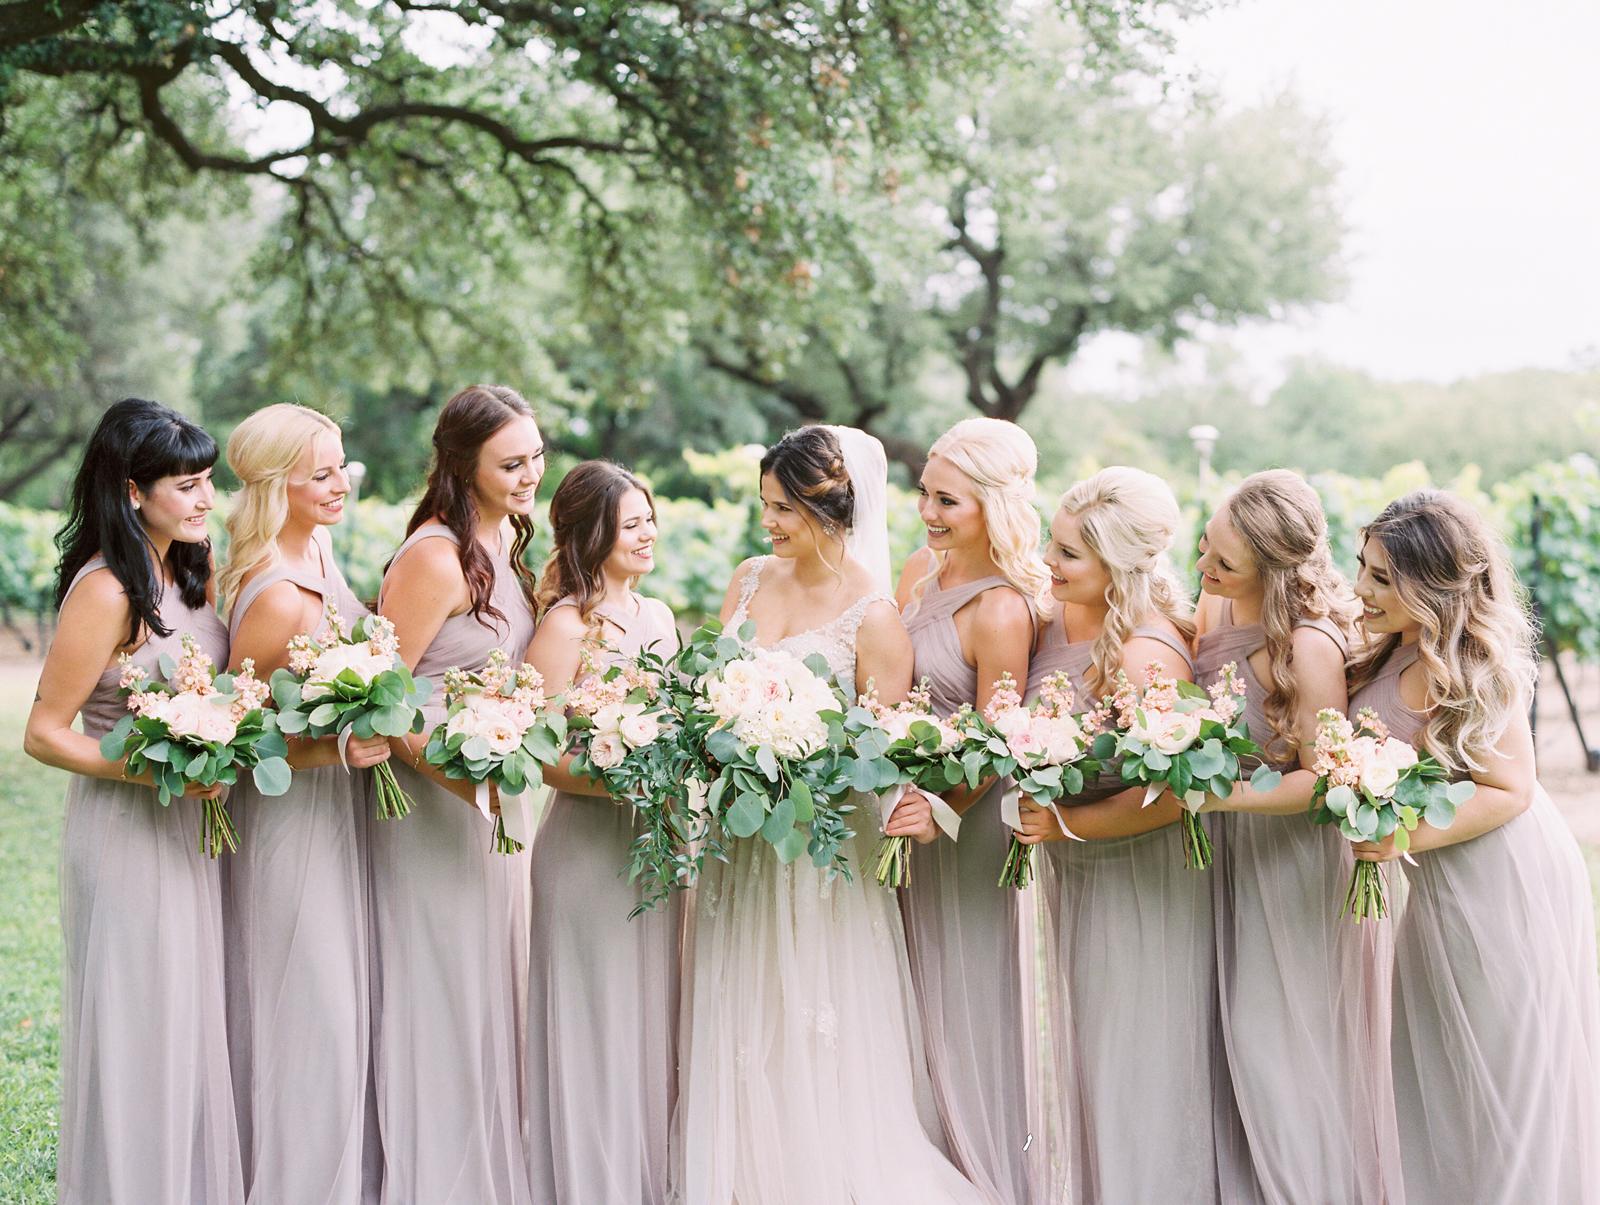 Elegant Spring Vineyard Wedding | Film Wedding Photographer | Austin Wedding Photographer | Romantic Neutral Bridesmaid Dresses, Simple Bride Bouquet | Britni Dean Photography // britnidean.com